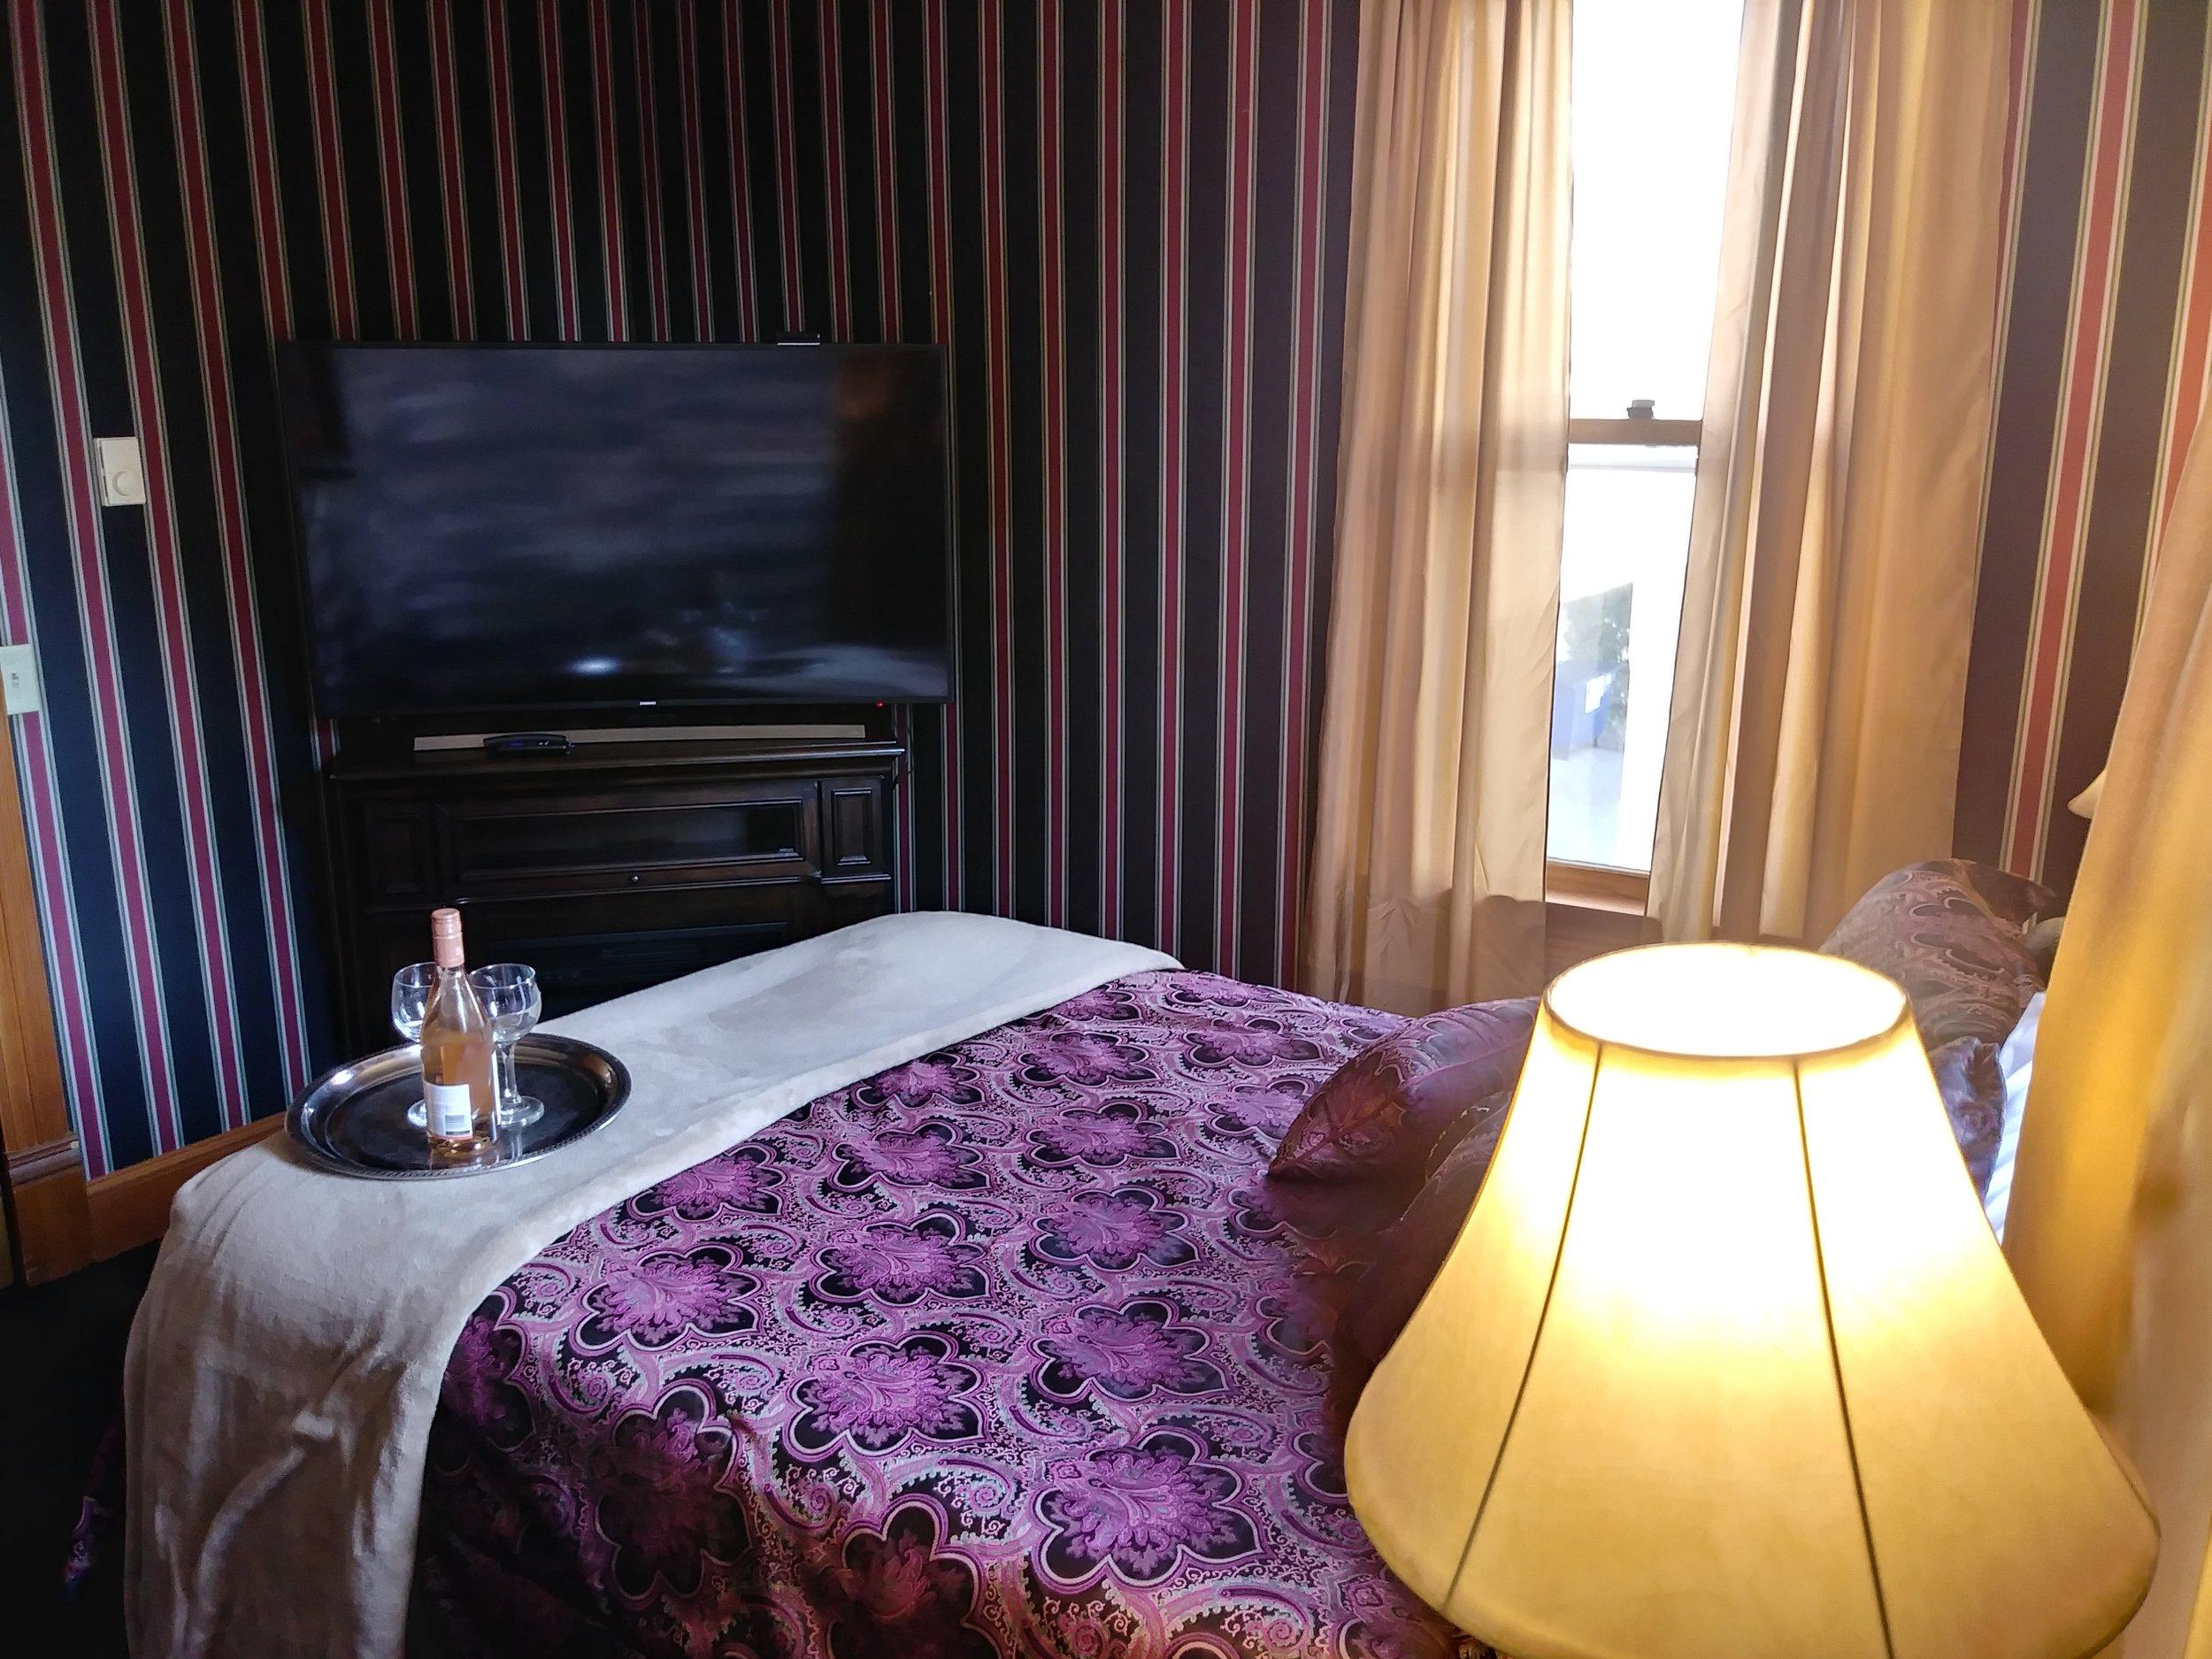 Room 207 10.jpg